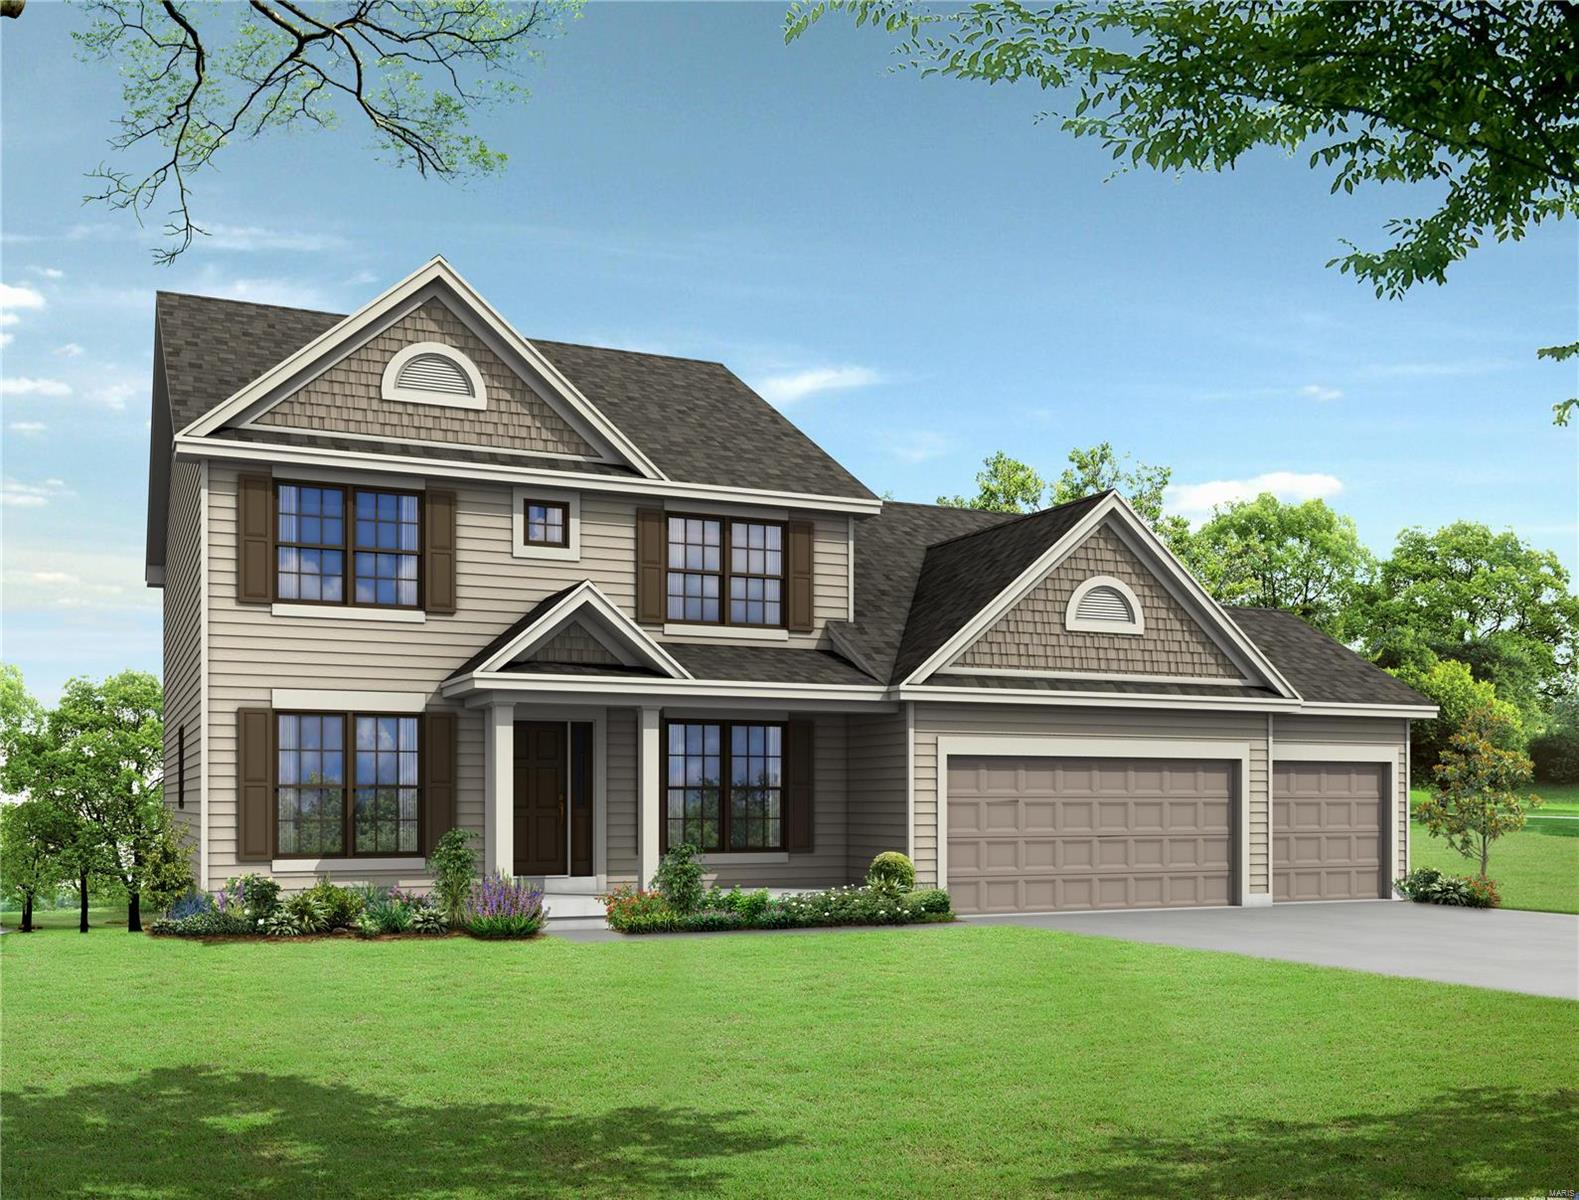 2 Westlake / Liberty Model Property Photo - Pacific, MO real estate listing